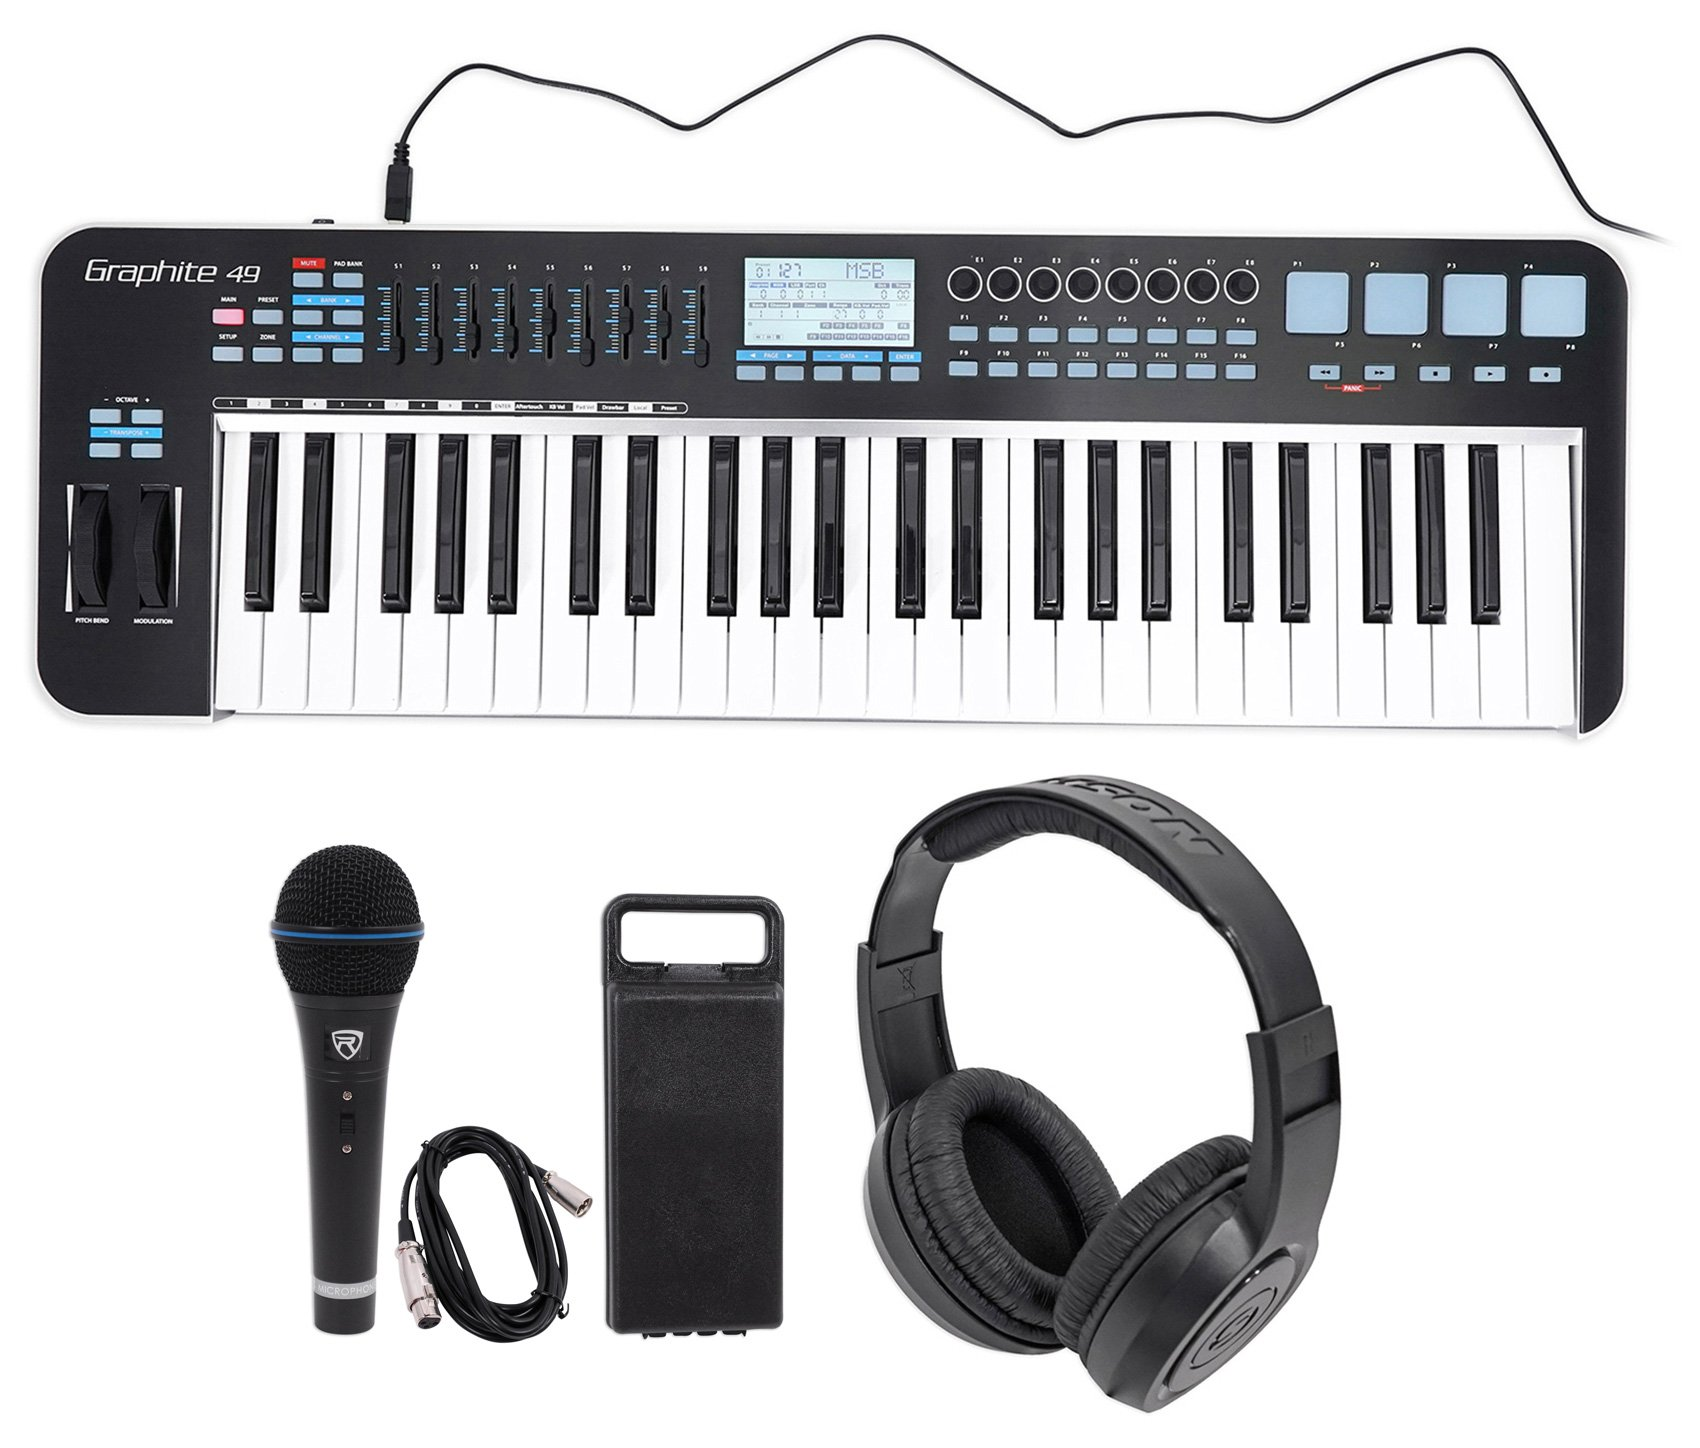 Samson Graphite 49 Key USB MIDI DJ Keyboard Controller+Headphones+Mic+Cable+Case